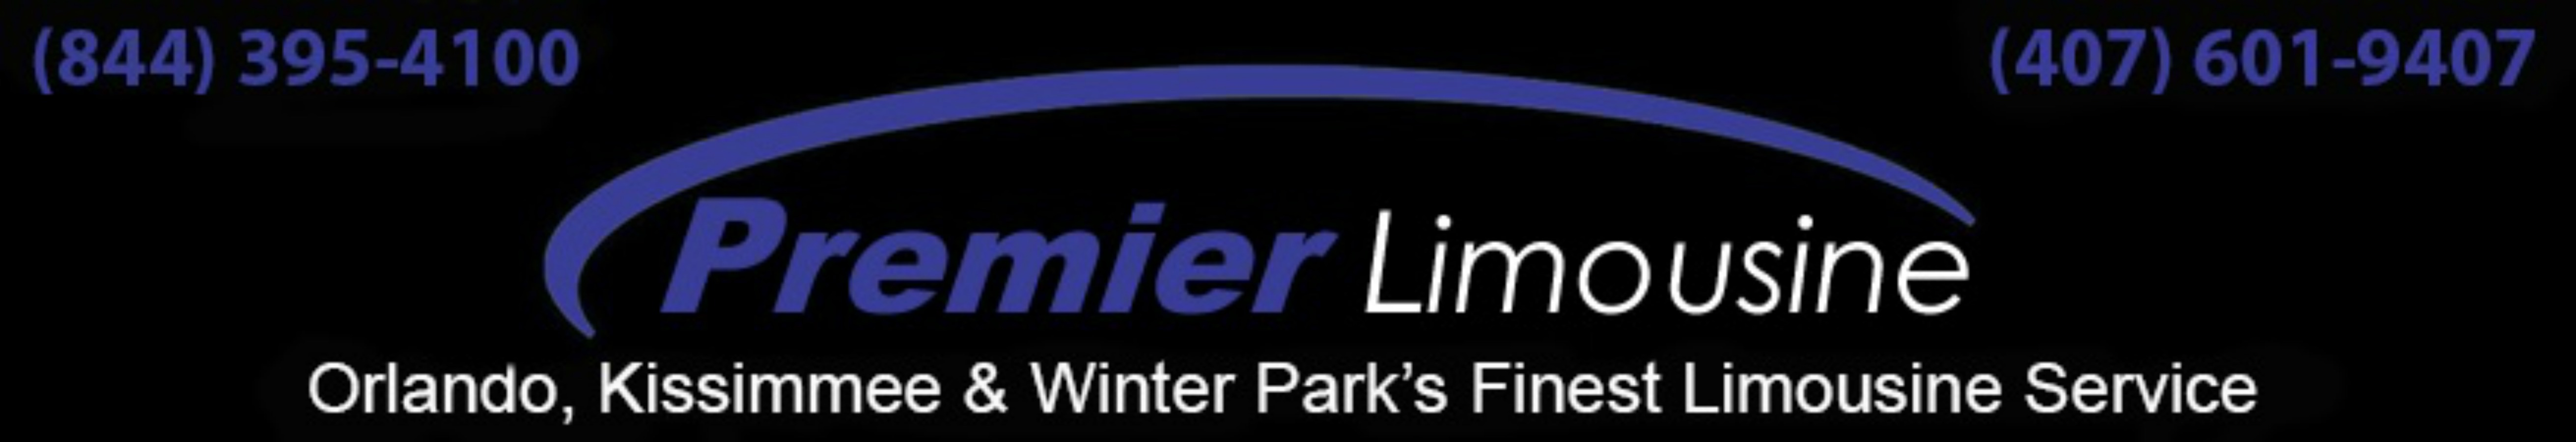 Premier Limousine Service - Orlando, Florida Logo